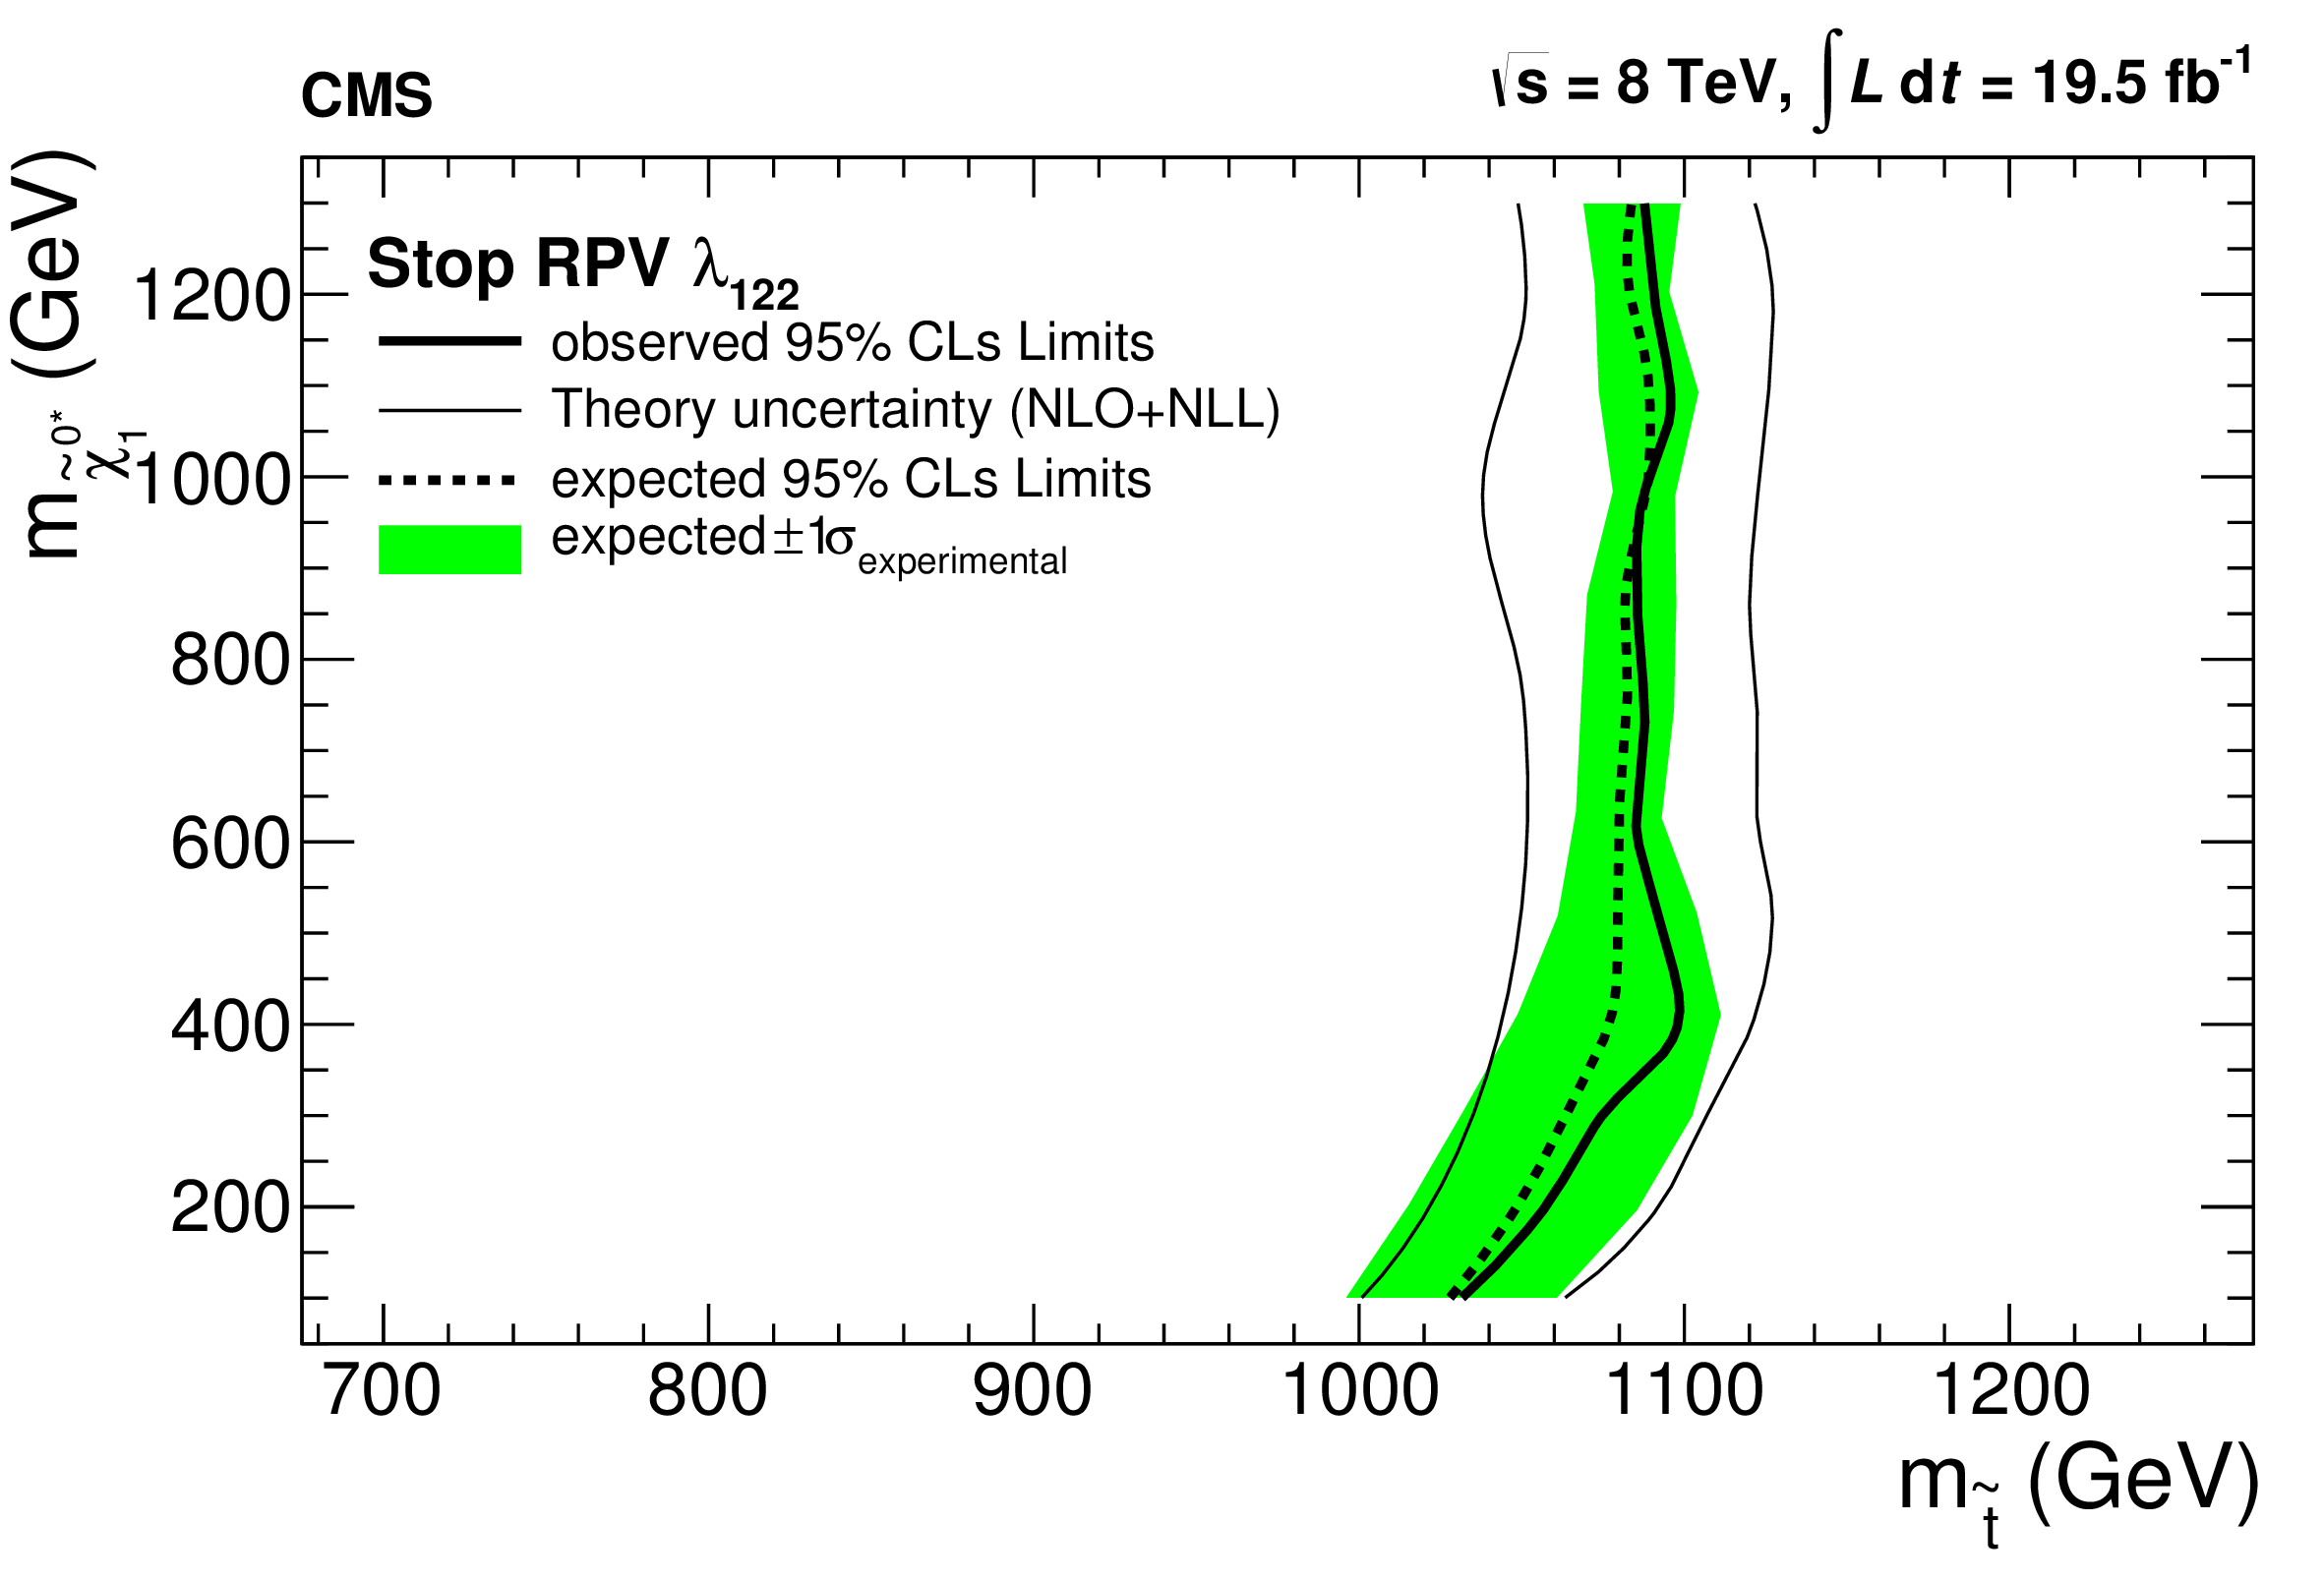 curve_StopRPV_LLE122.png